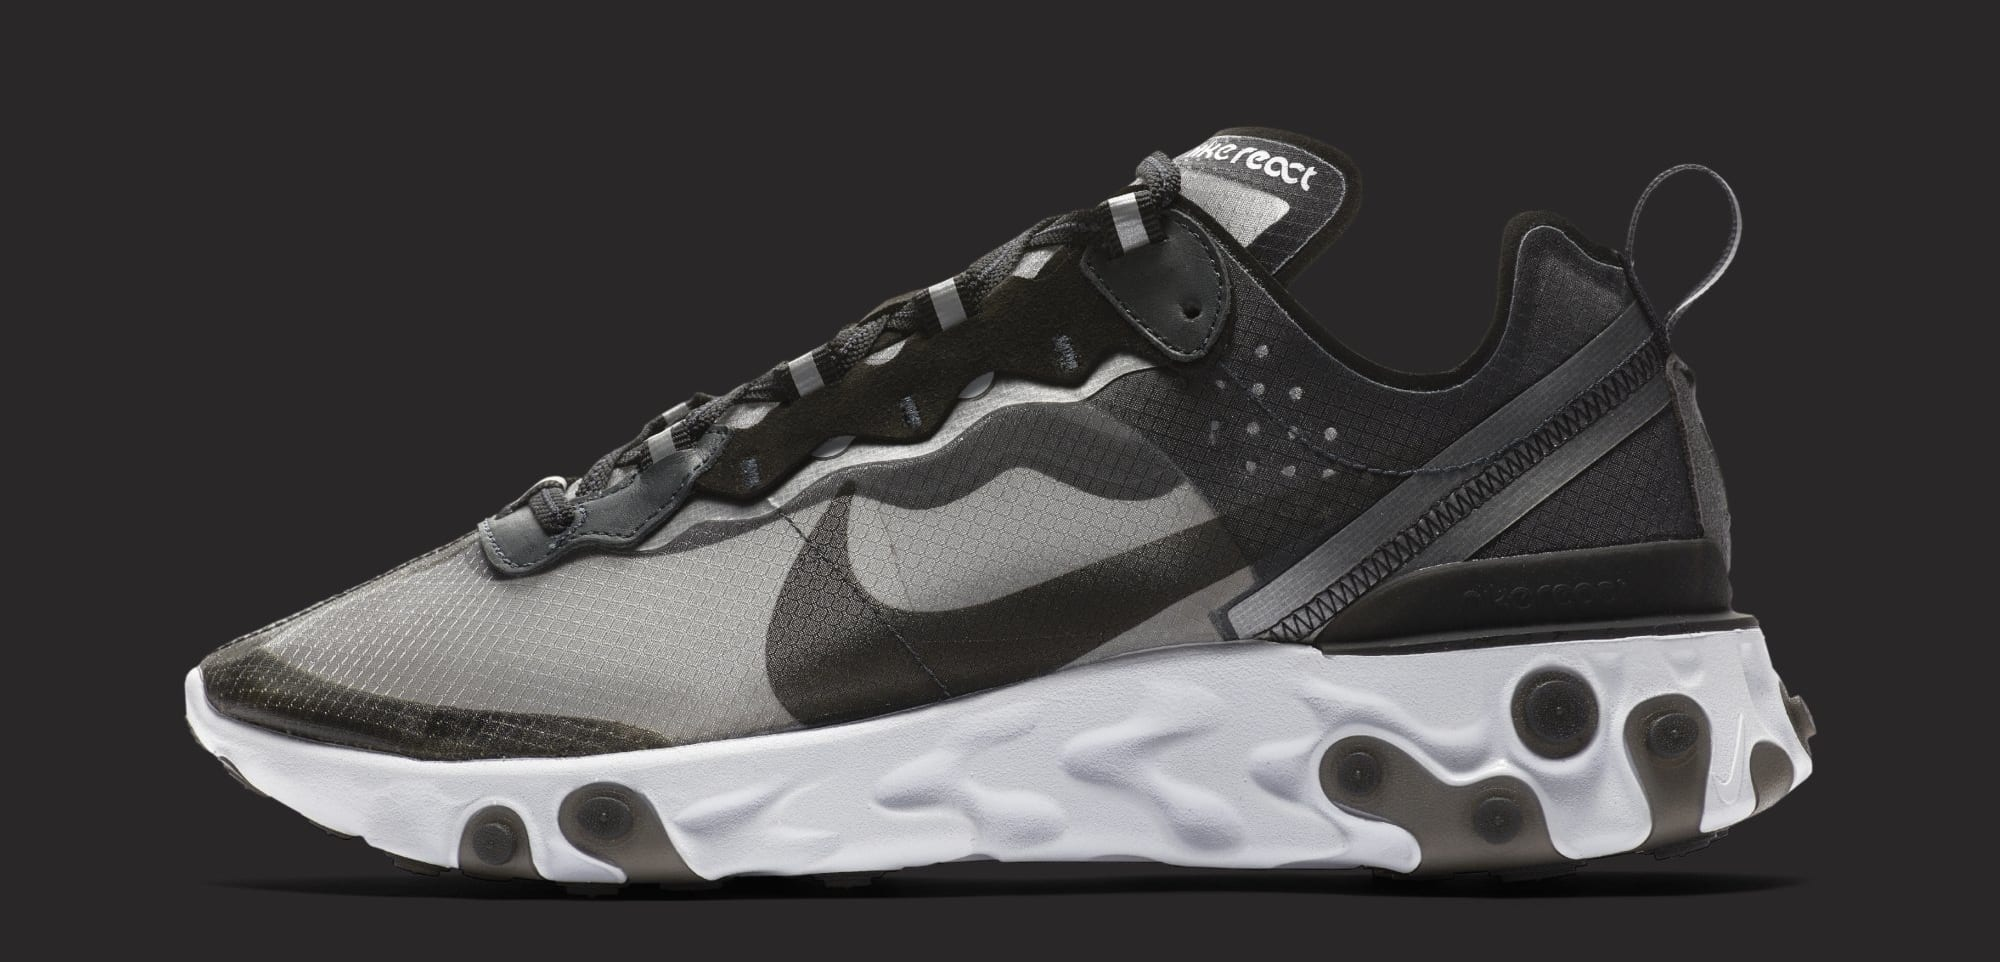 Nike React Element 87 'Anthracite/Black/White' AQ1090-001 (Lateral)